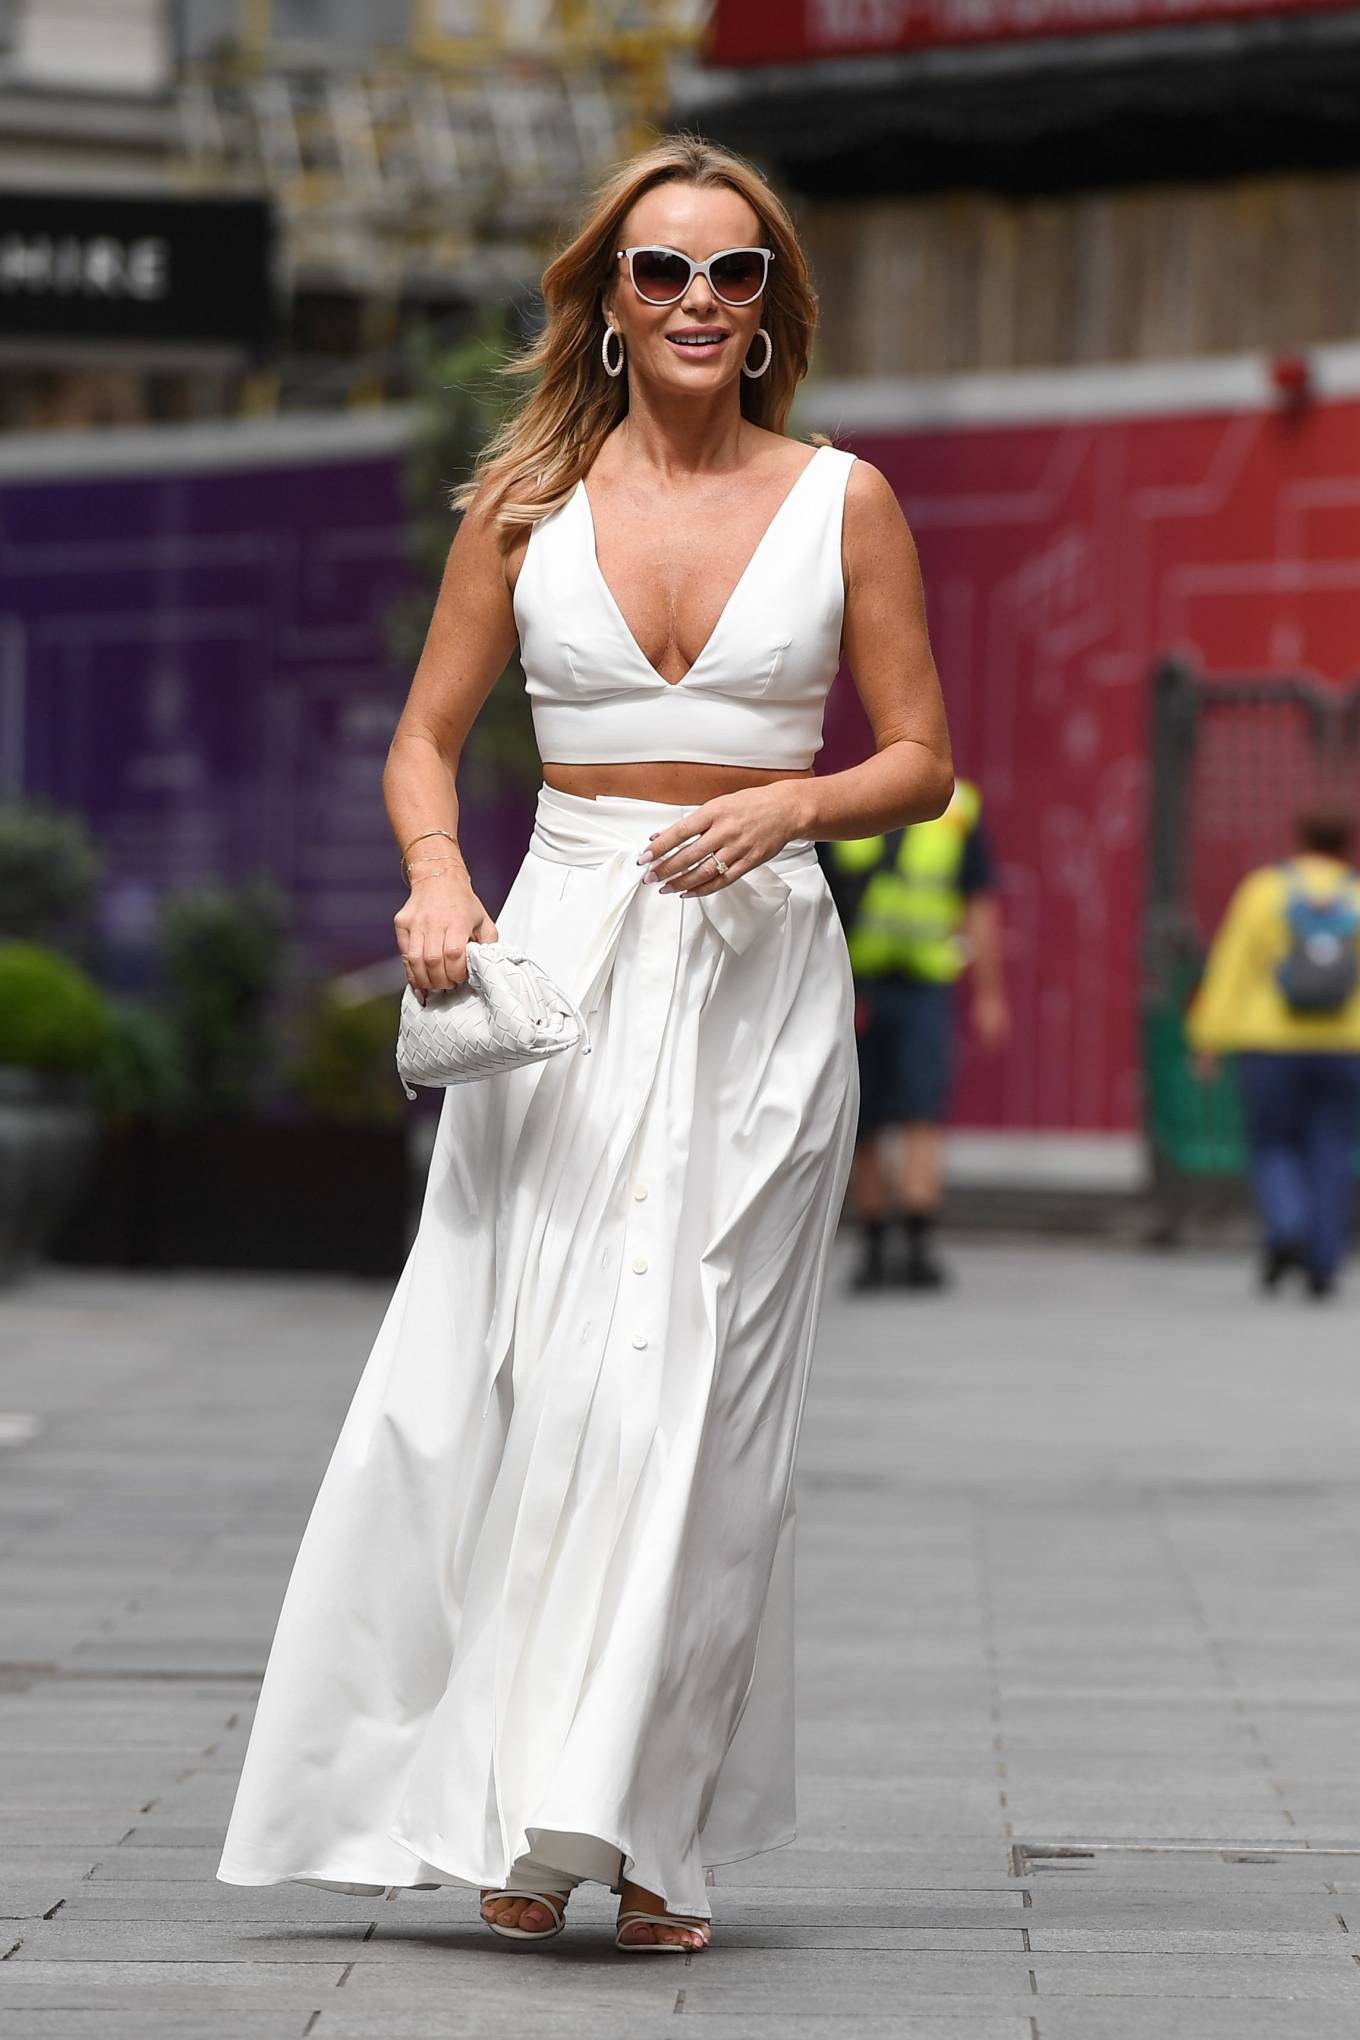 Amanda Holden 2021 : Amanda Holden – In a white dress at Global Studios in London-14